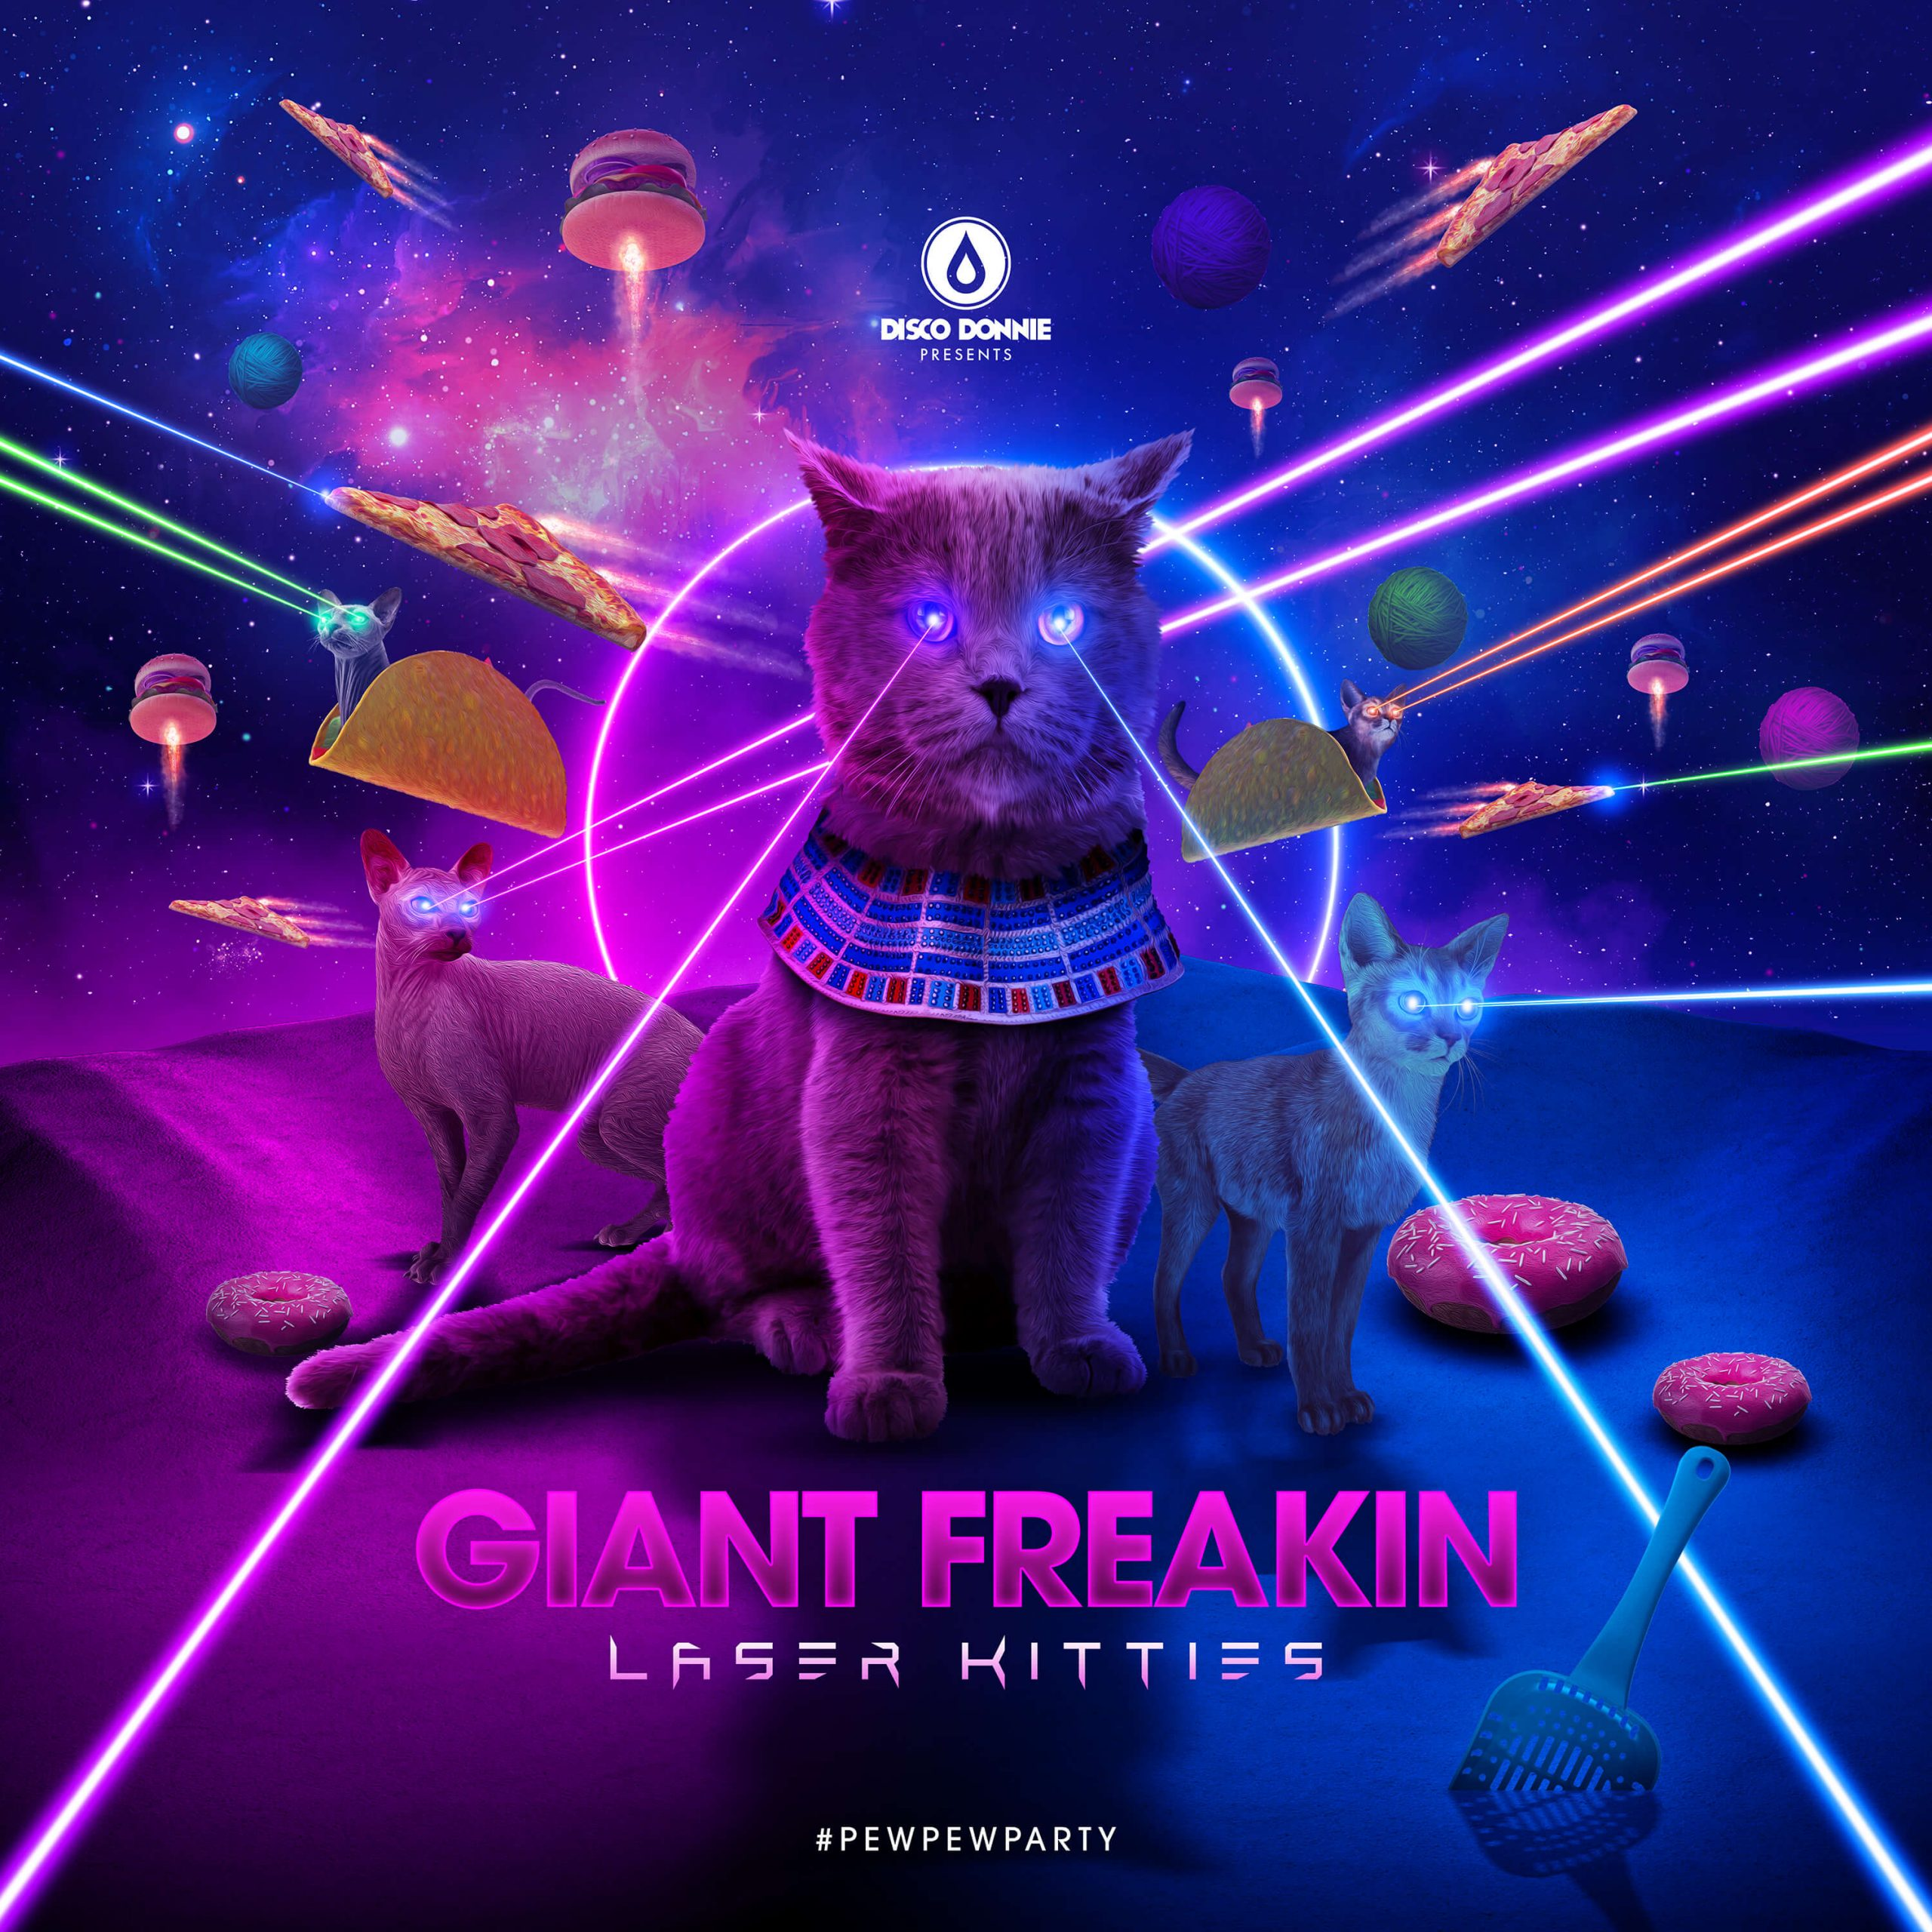 Giant Freakin Laser Kitties